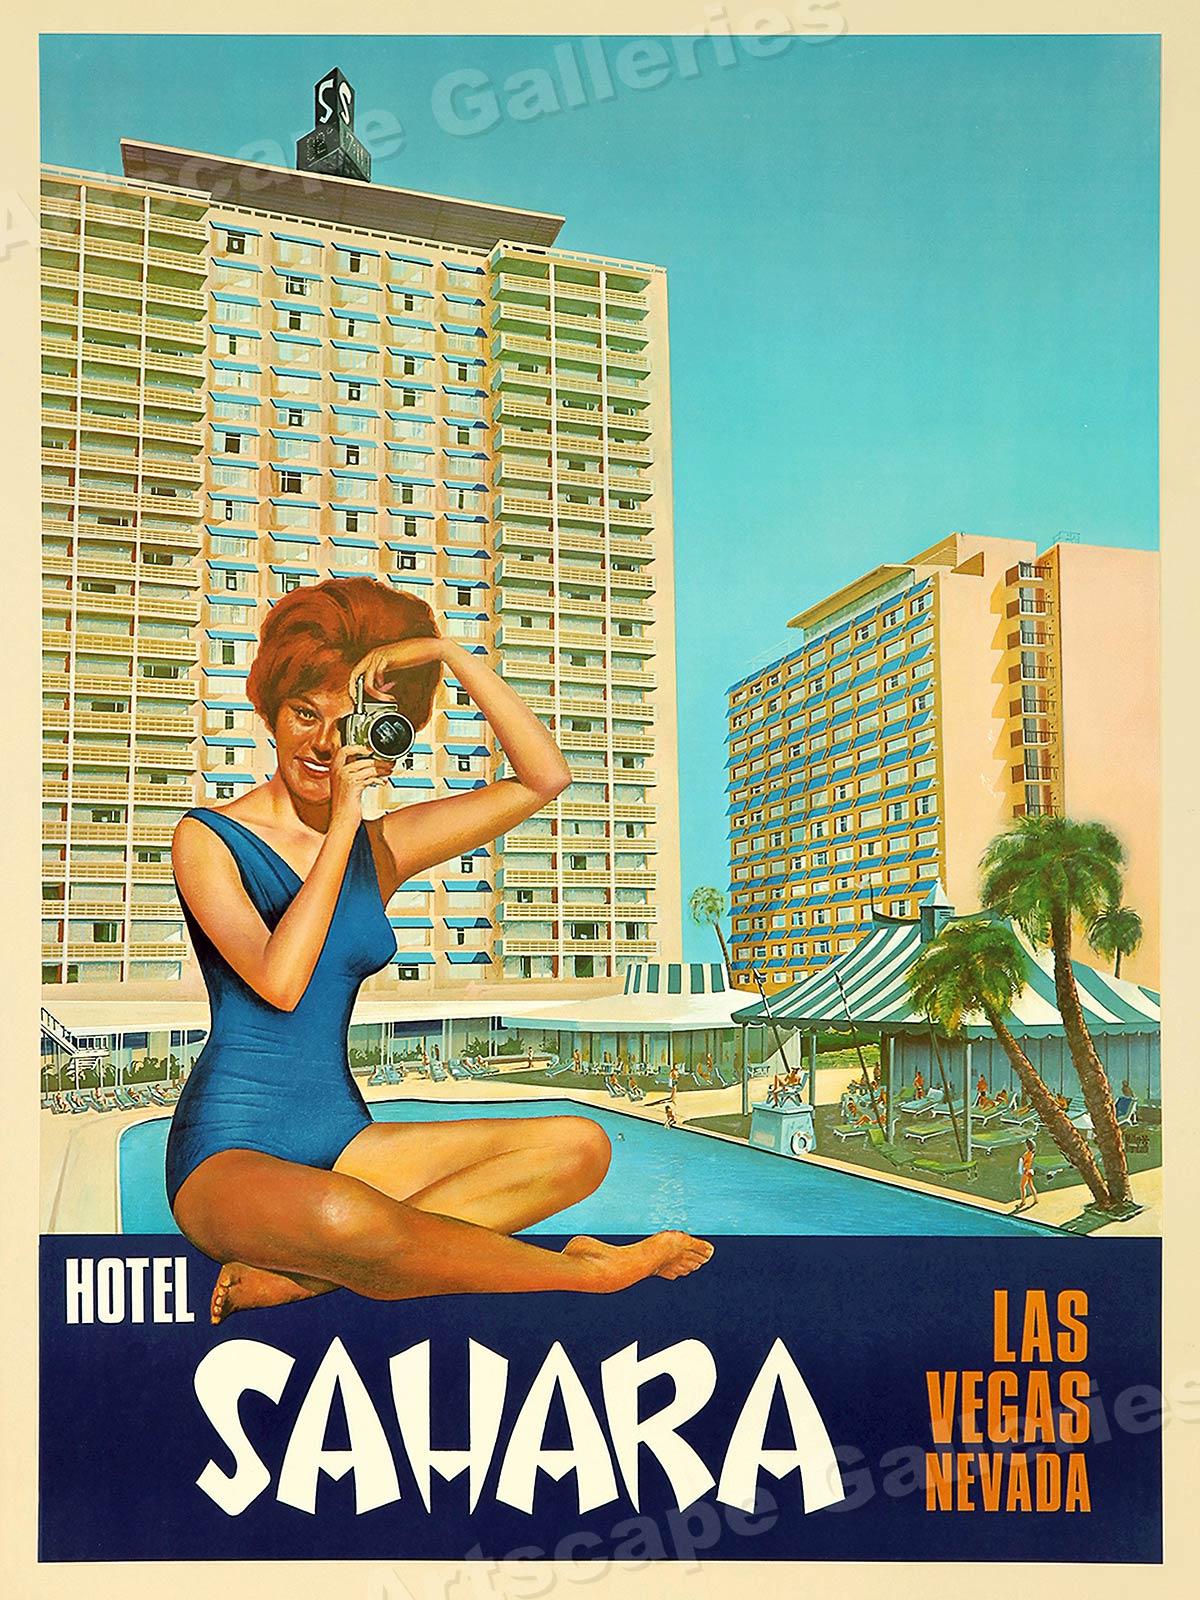 1960s Las Vegas Sahara Hotel Vintage Rat Pack Style Travel